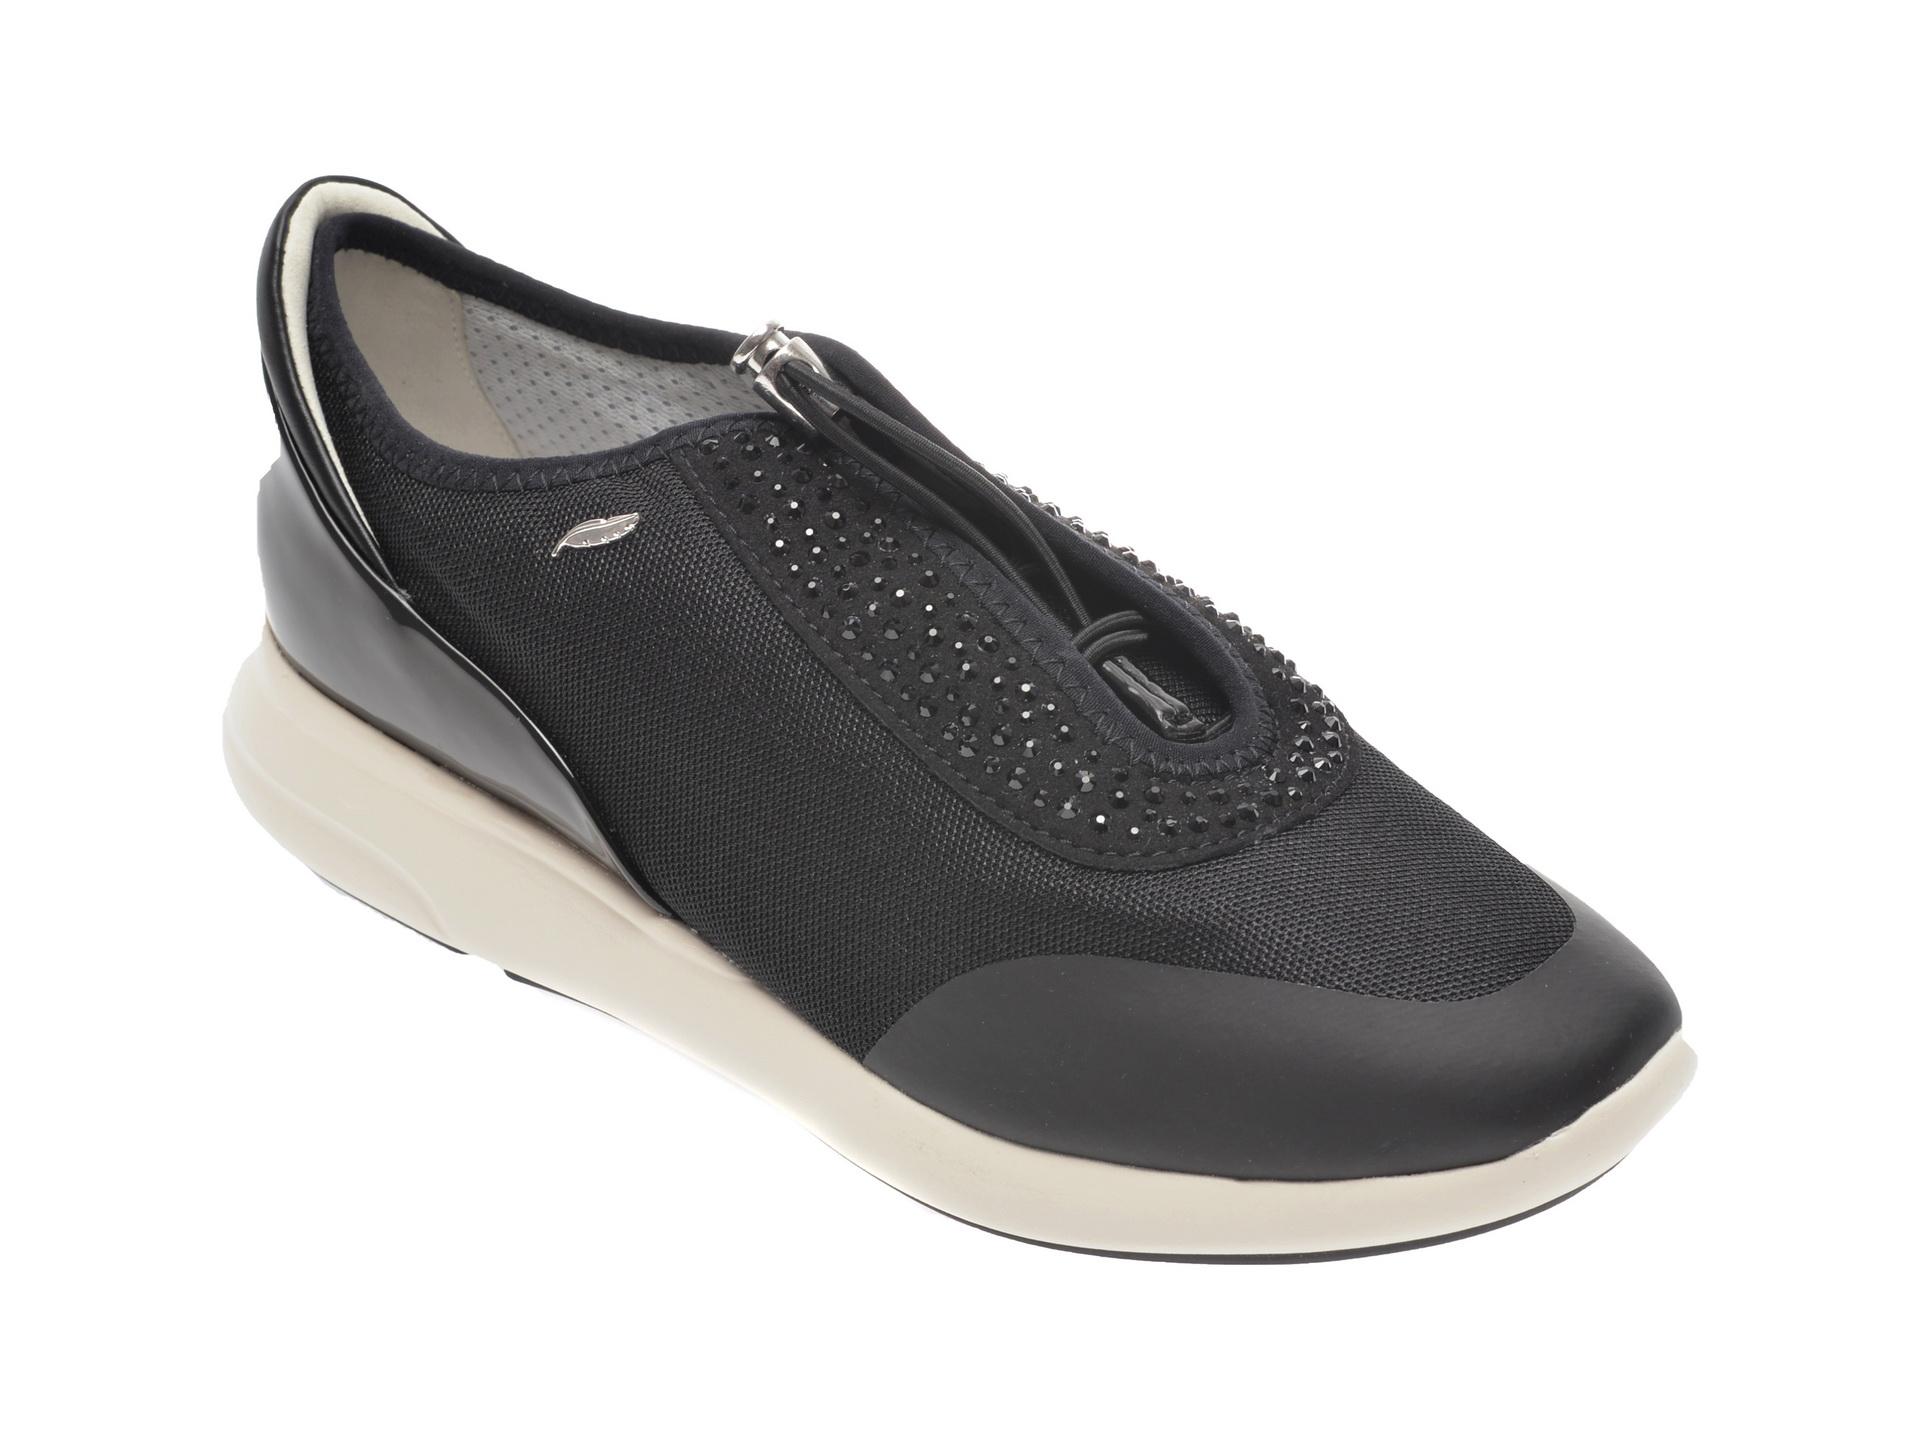 Pantofi sport GEOX negri, D621CE, din material textil si piele ecologica